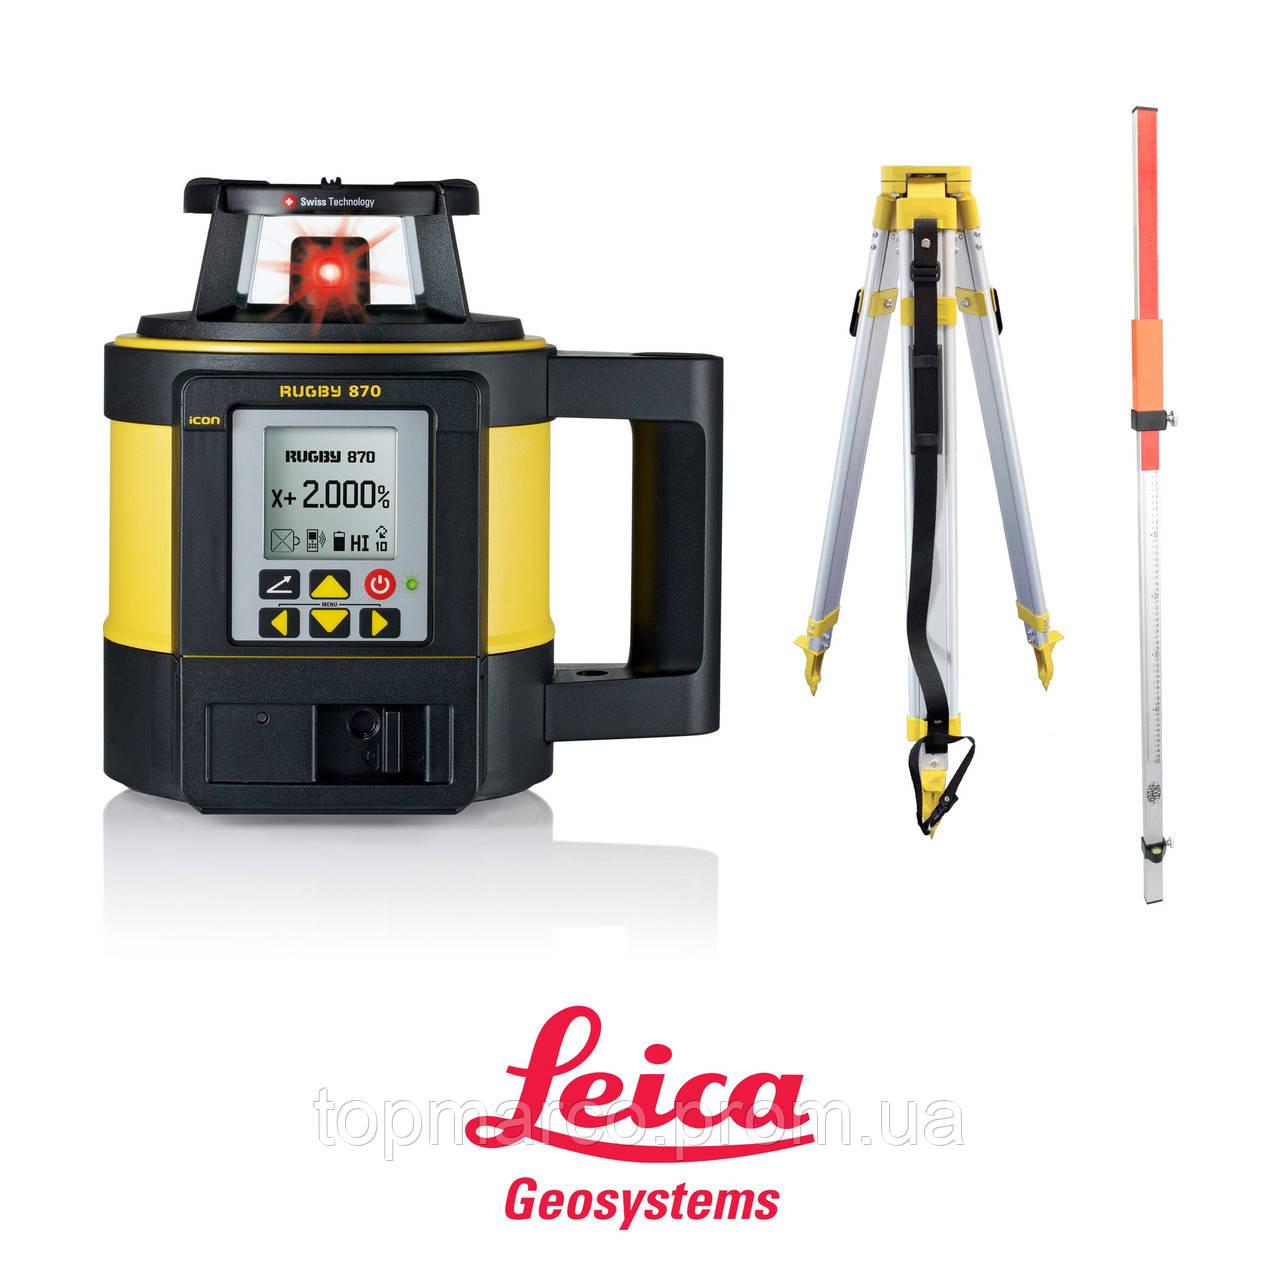 Лазерный нивелир Leica Rugby 870 RE160 батарея